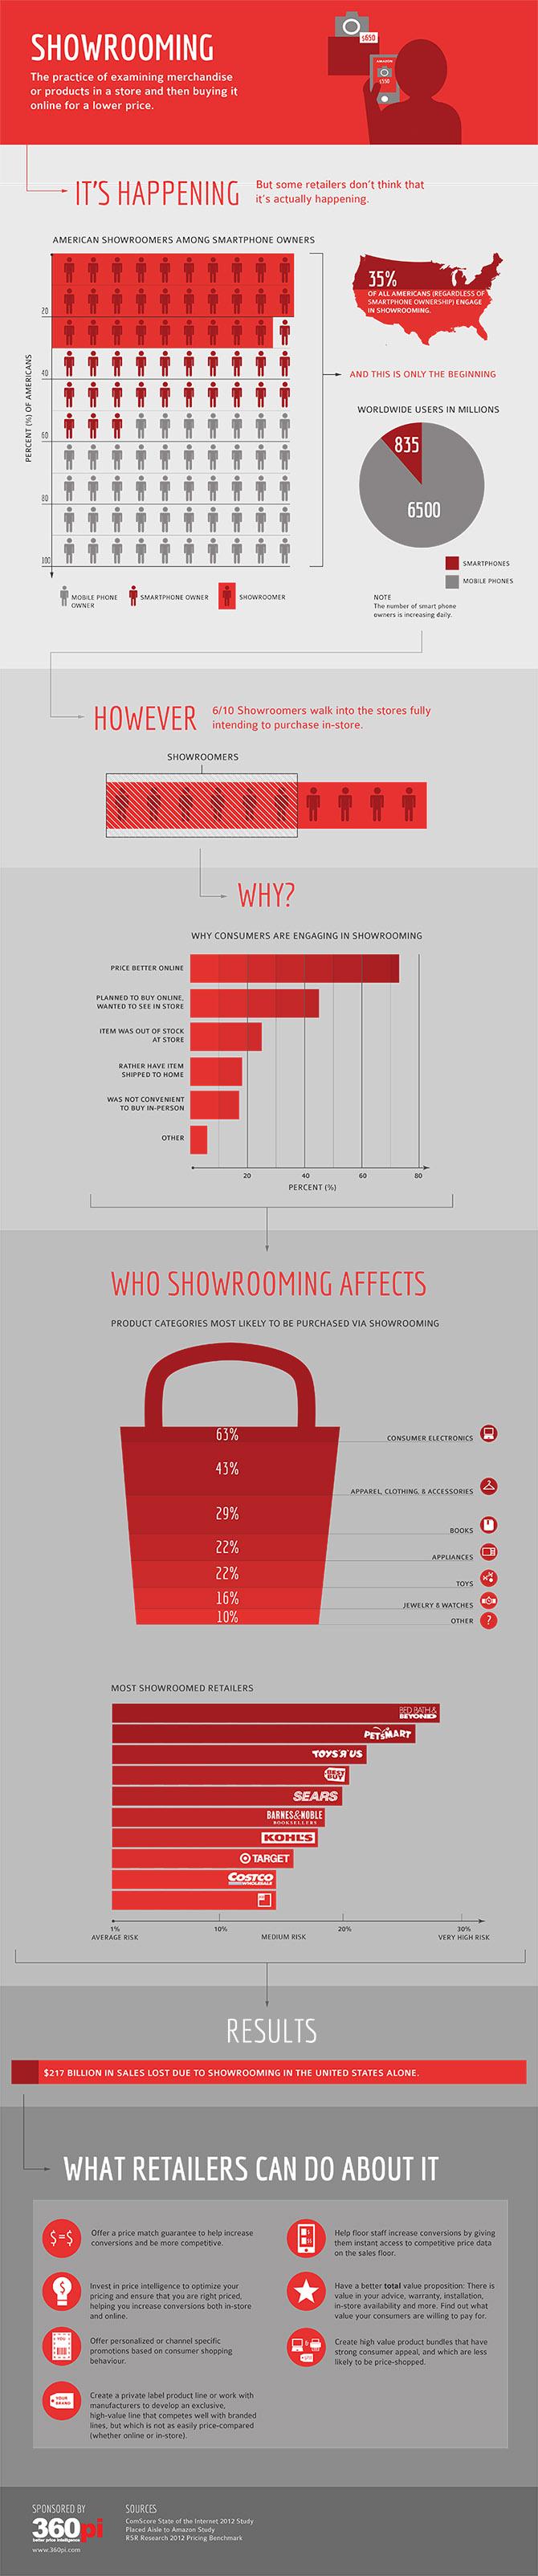 Showrooming8_8